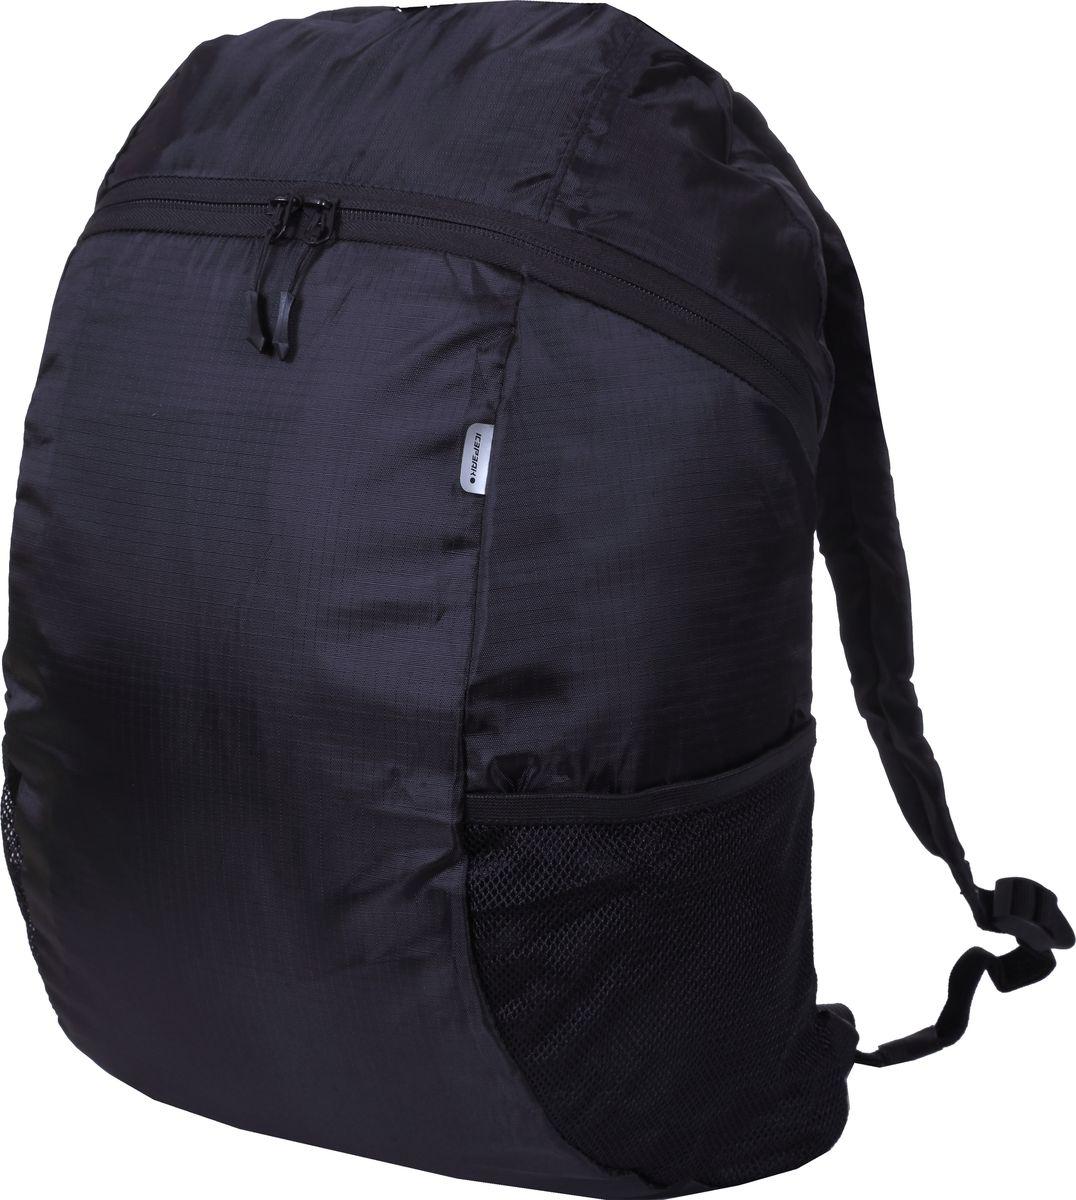 Рюкзак Icepeak, 359554000IV, черный icepeak рюкзак icepeak размер без размера